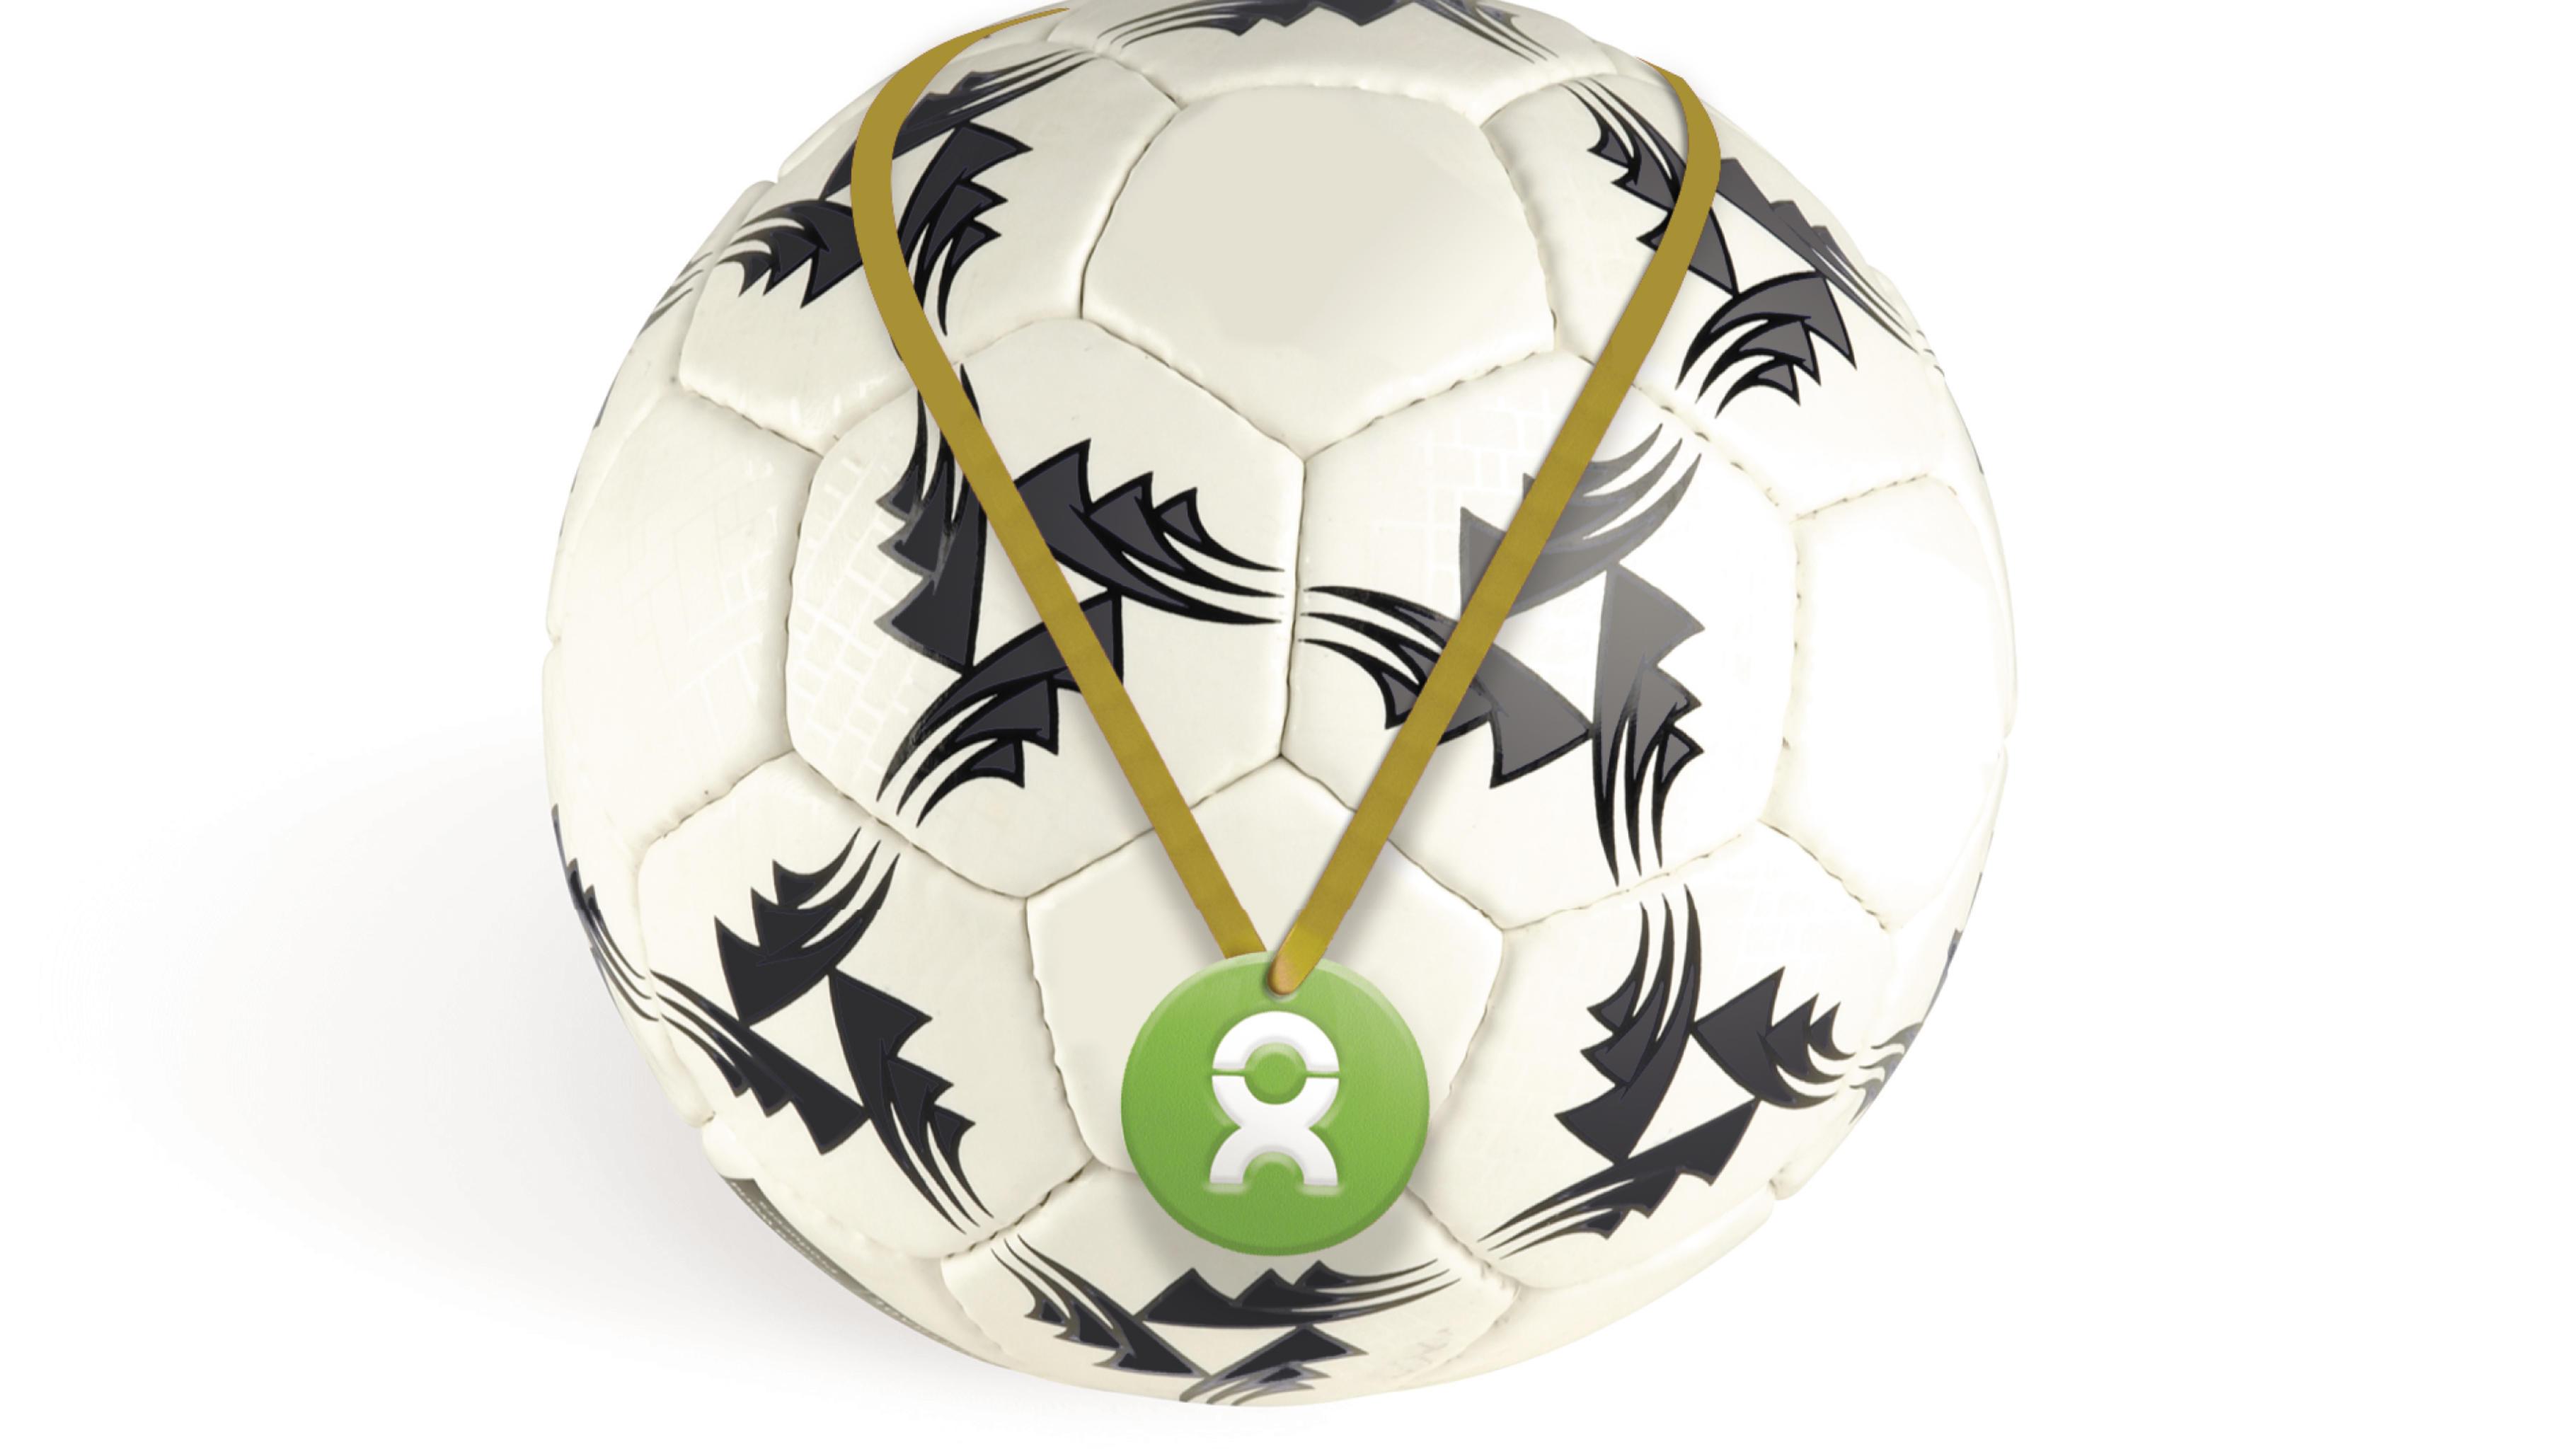 Foto: OxfamUnverpackt Fußball